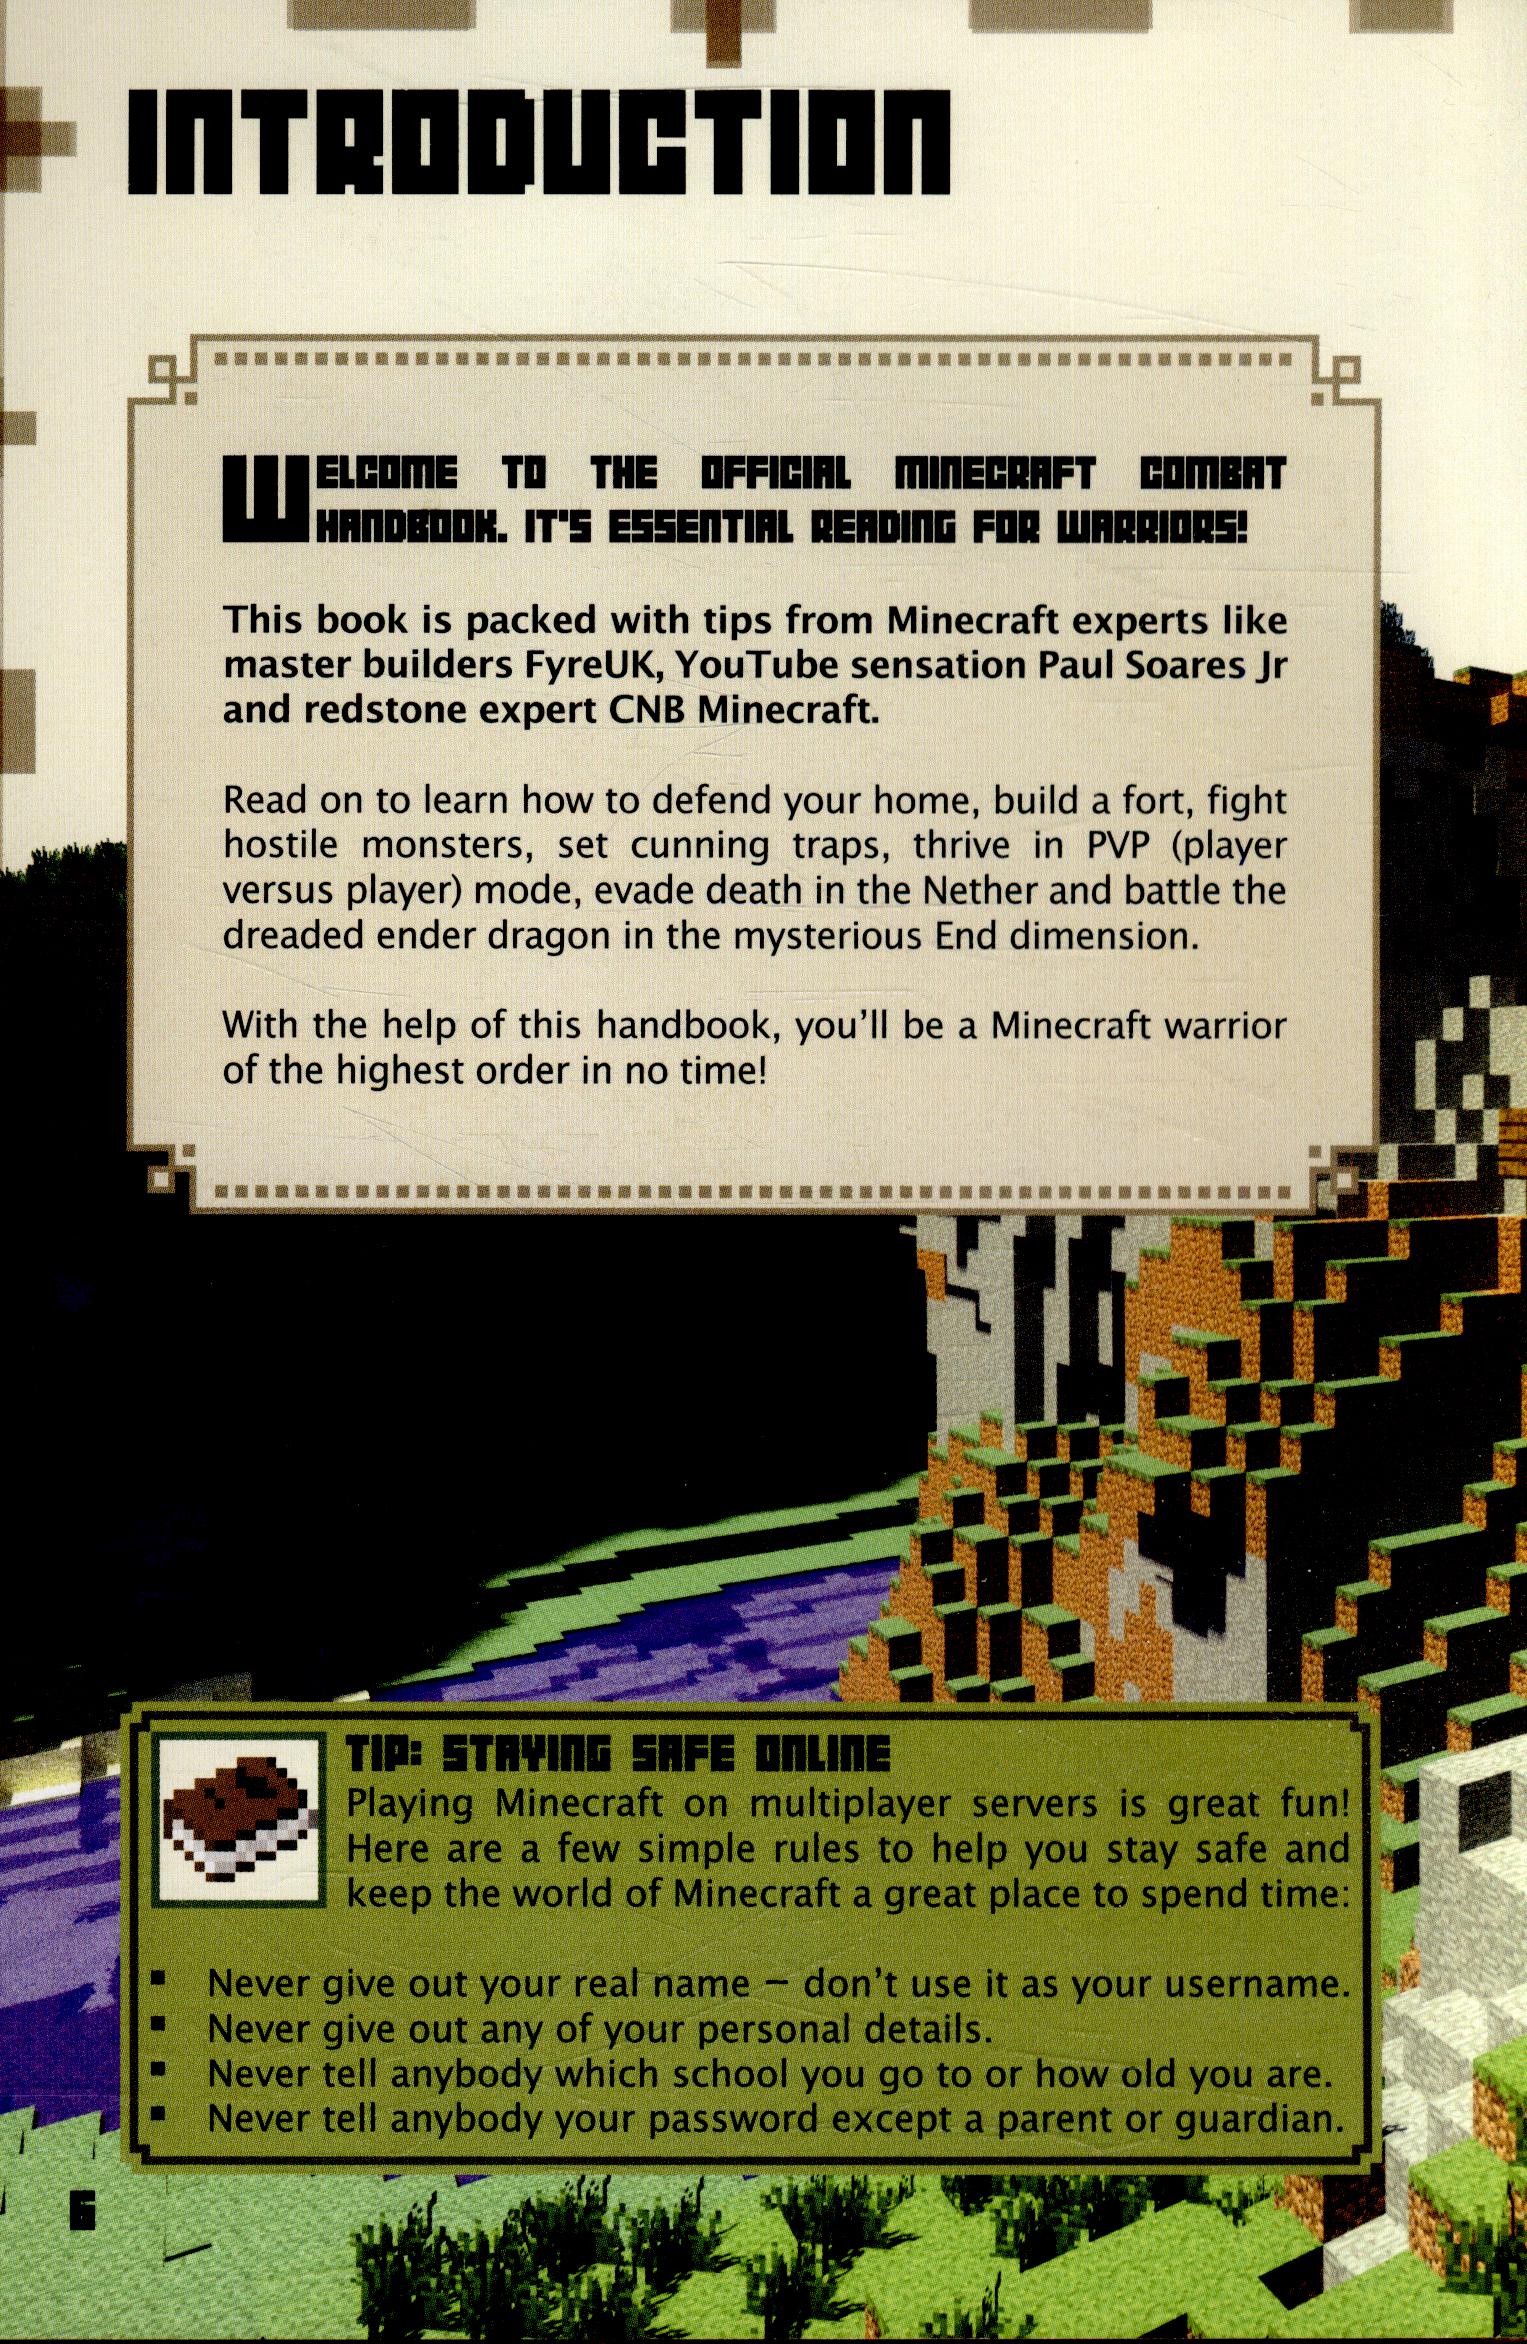 Minecraft : combat handbook by Mojang AB (9781405276795